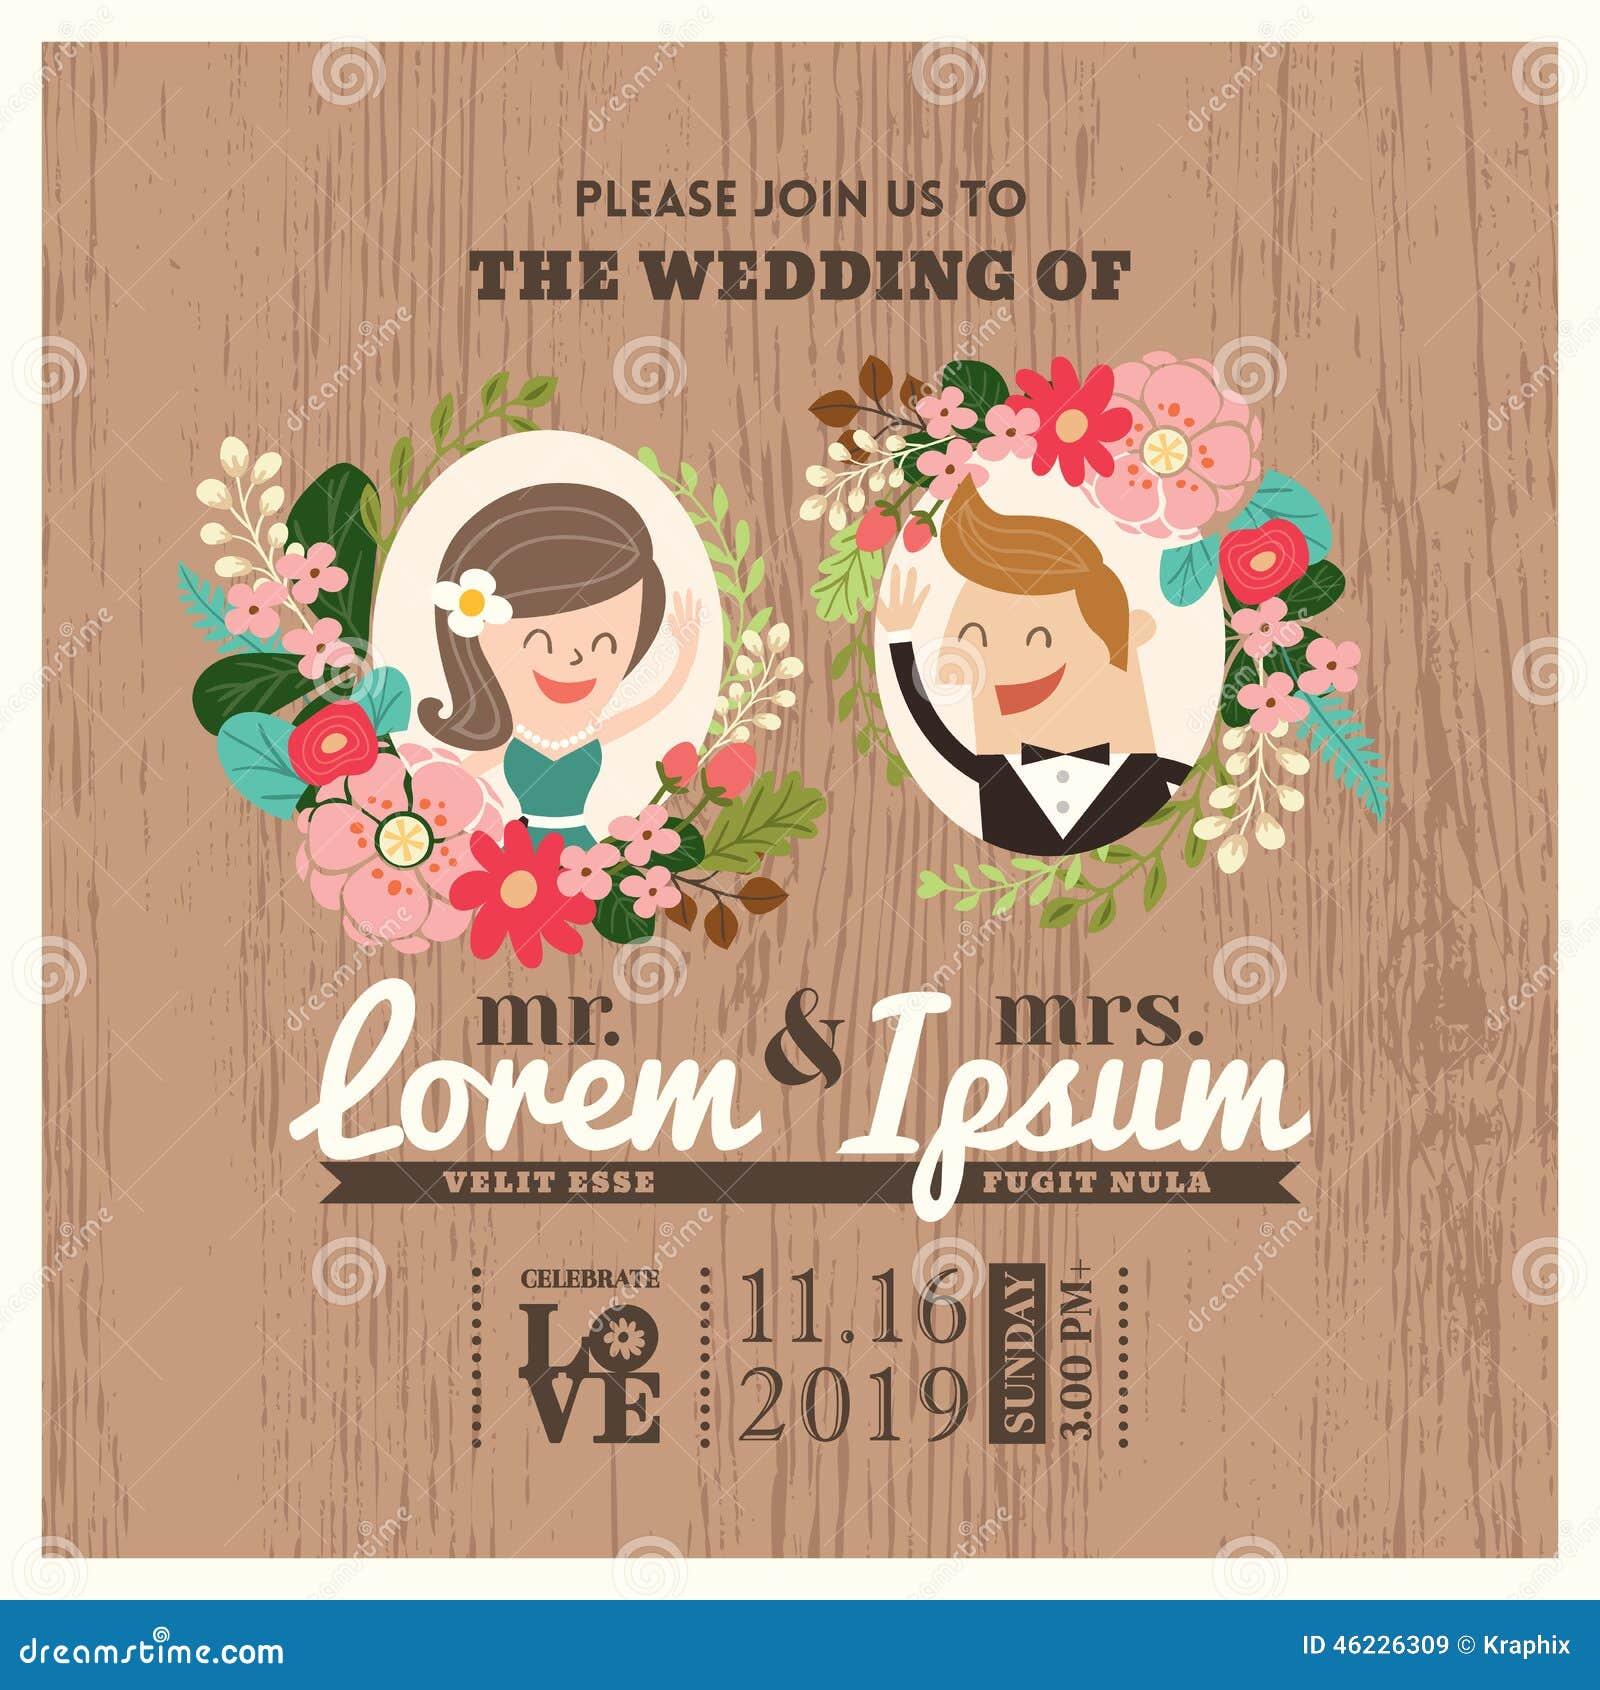 Tarjeta de la invitación de la boda con la historieta linda del novio y de la novia